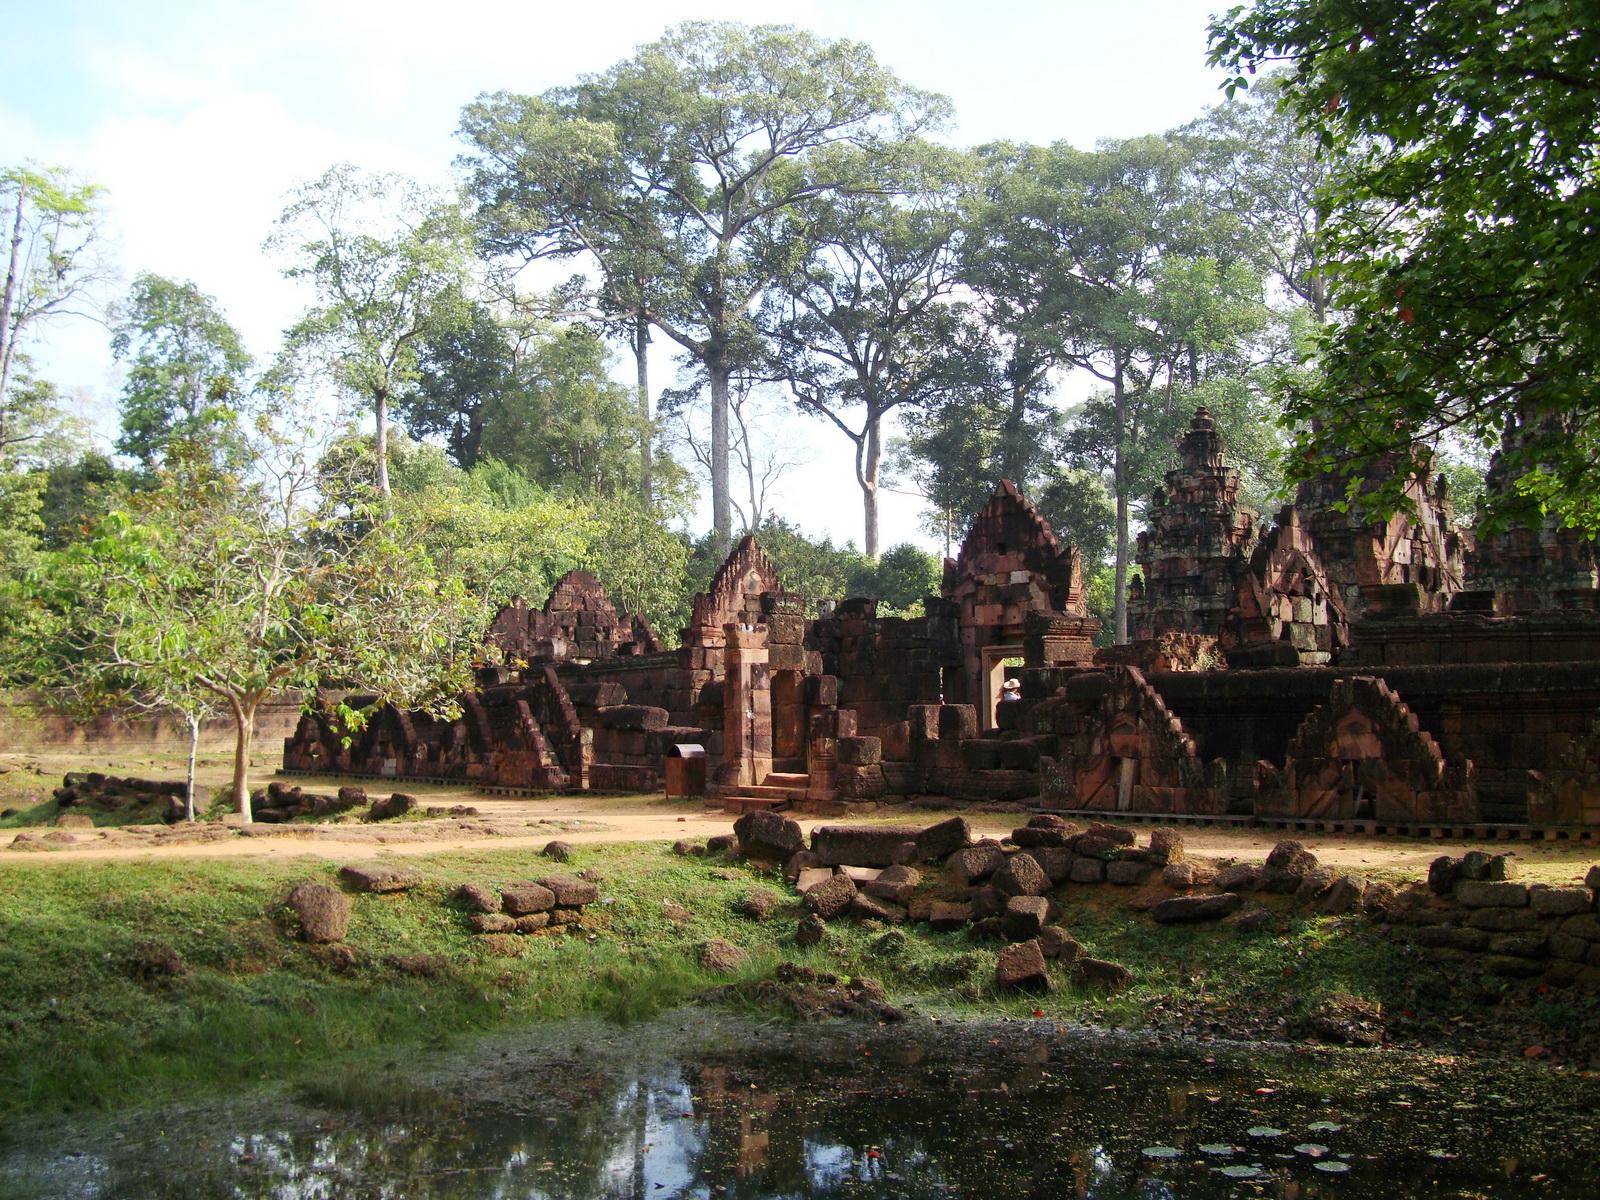 Banteay Srei 10th century Khmer architecture Tribhuvanamahesvara 06